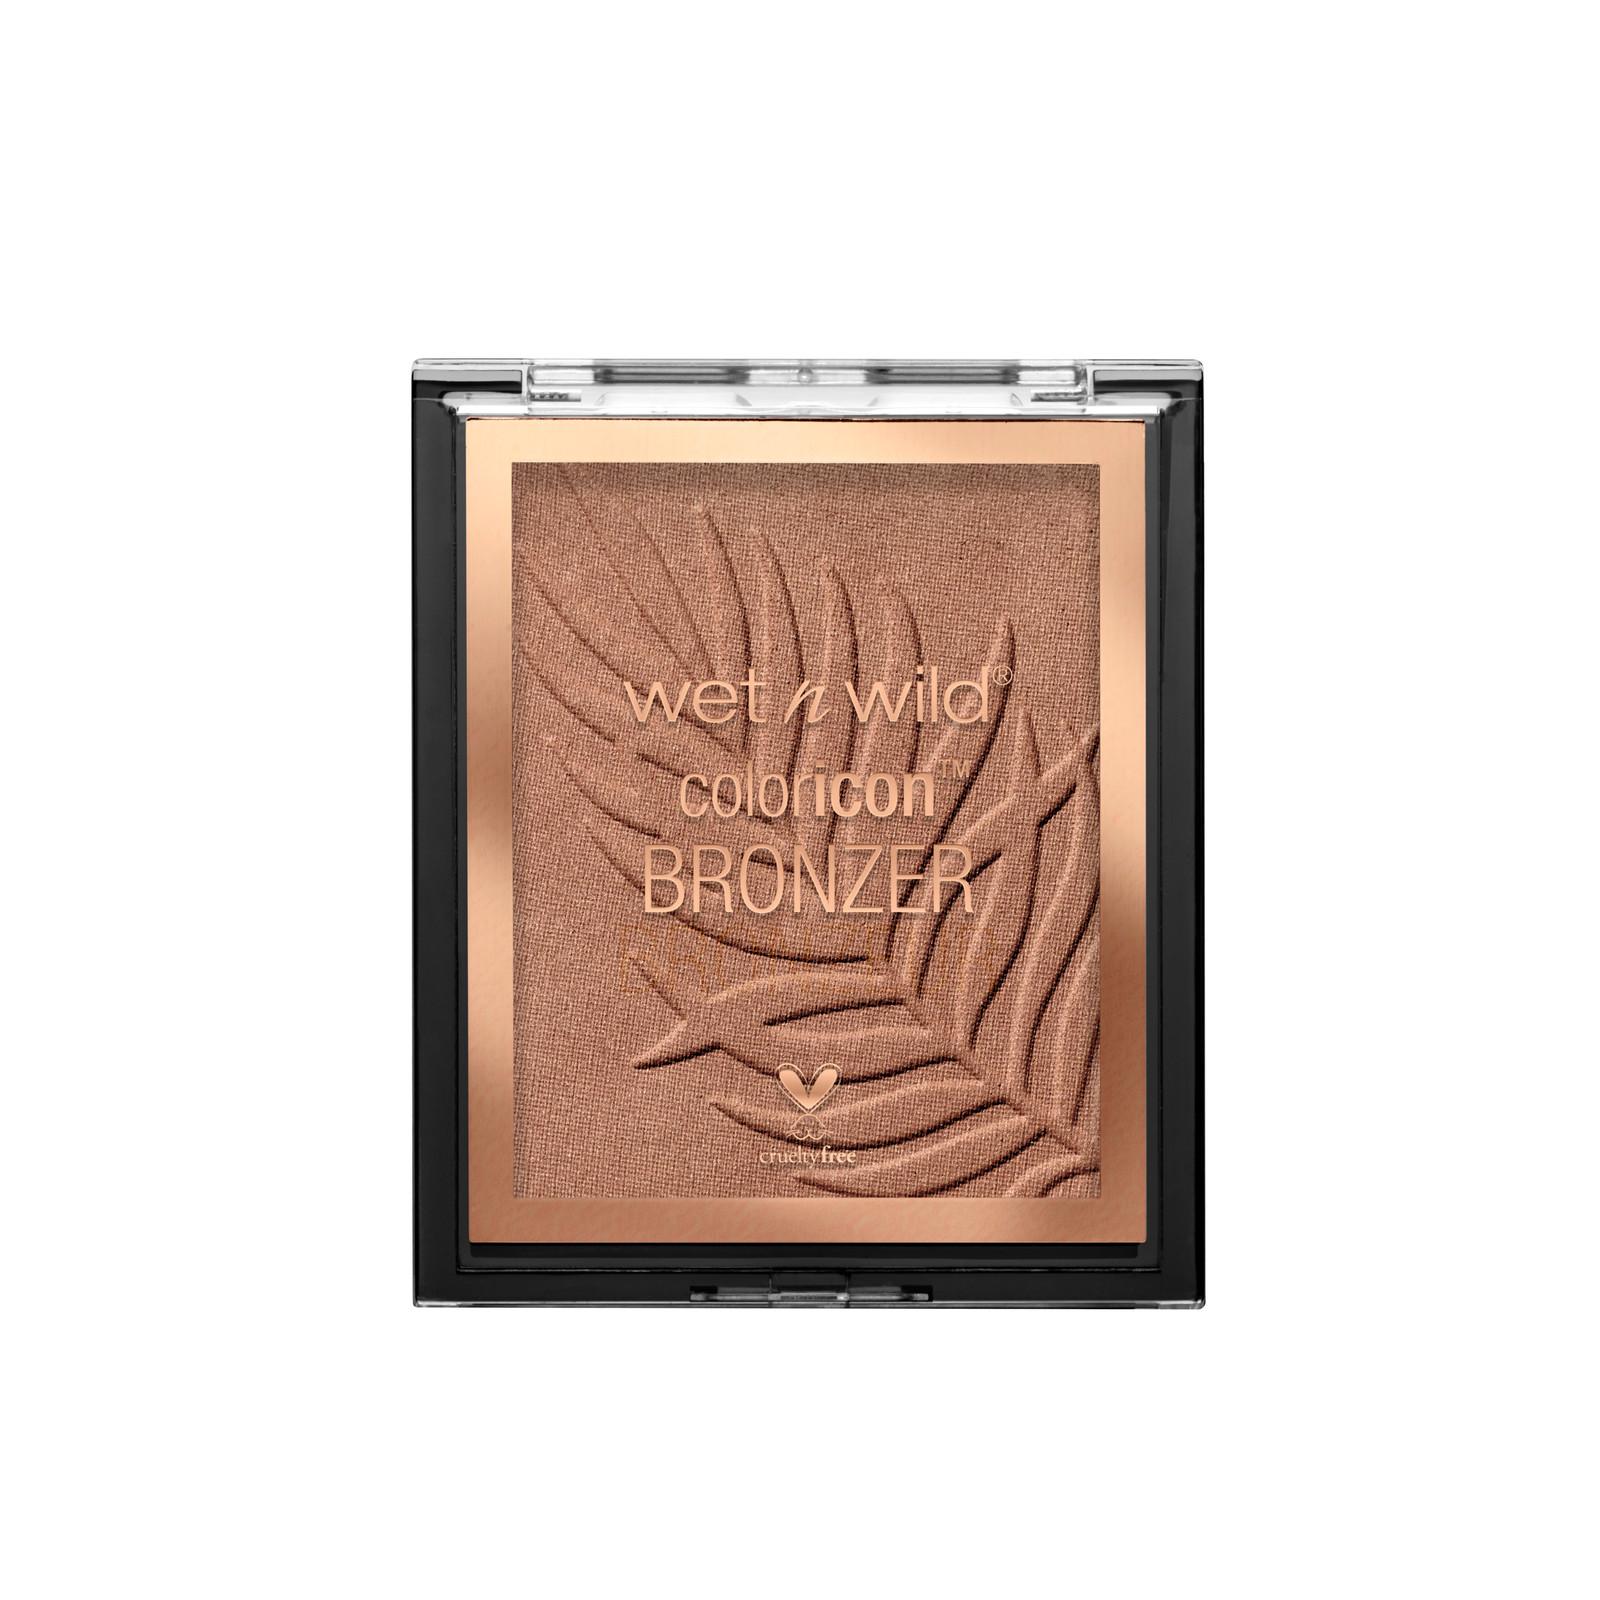 wet n wild Color Icon Bronzer, Sunset Striptease - $11.94